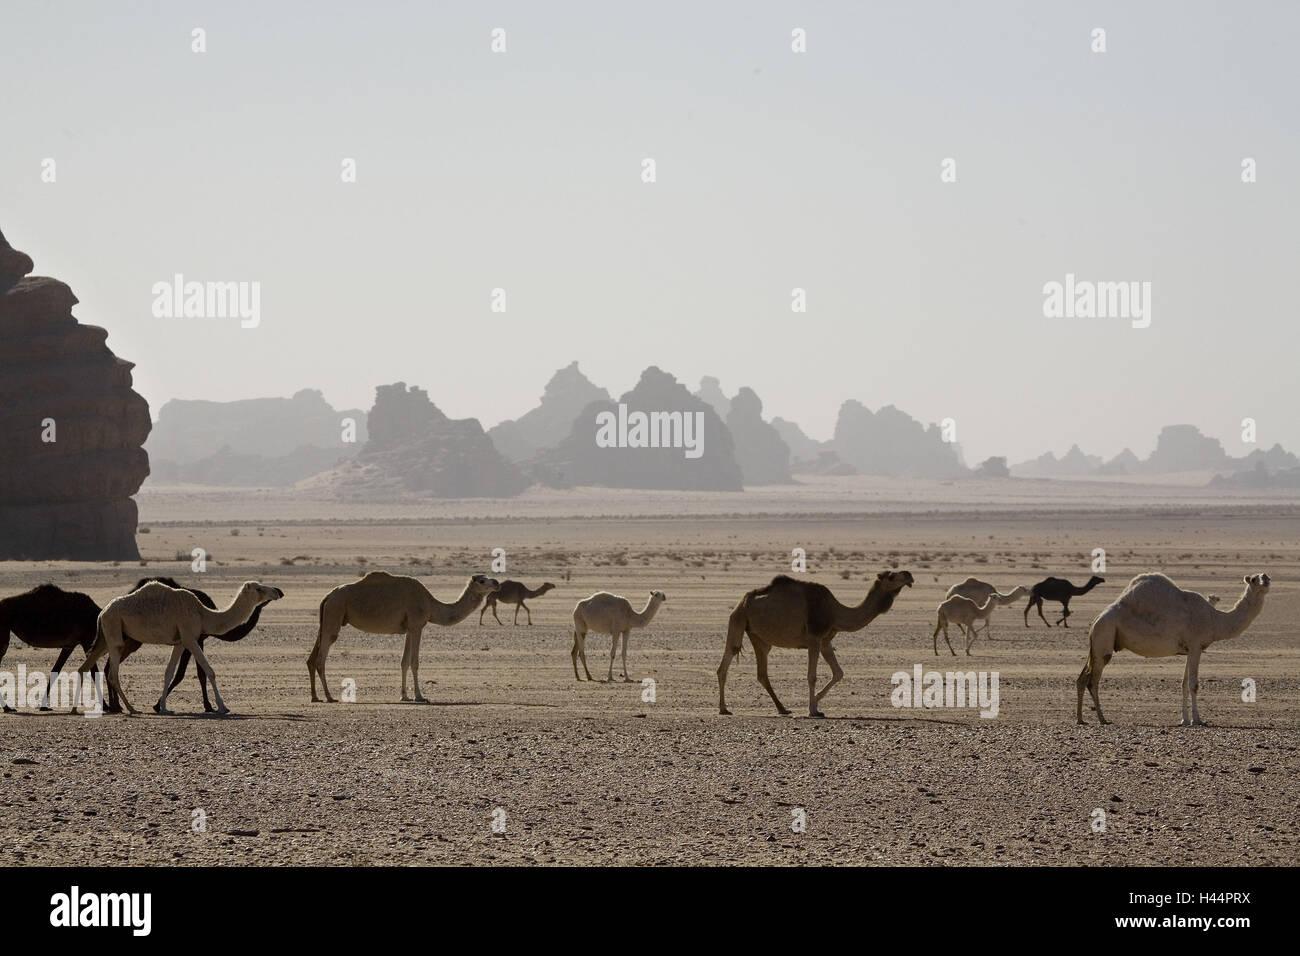 Saudi Arabia, province Tabuk, Hisma-mountain world, desert, camels, - Stock Image